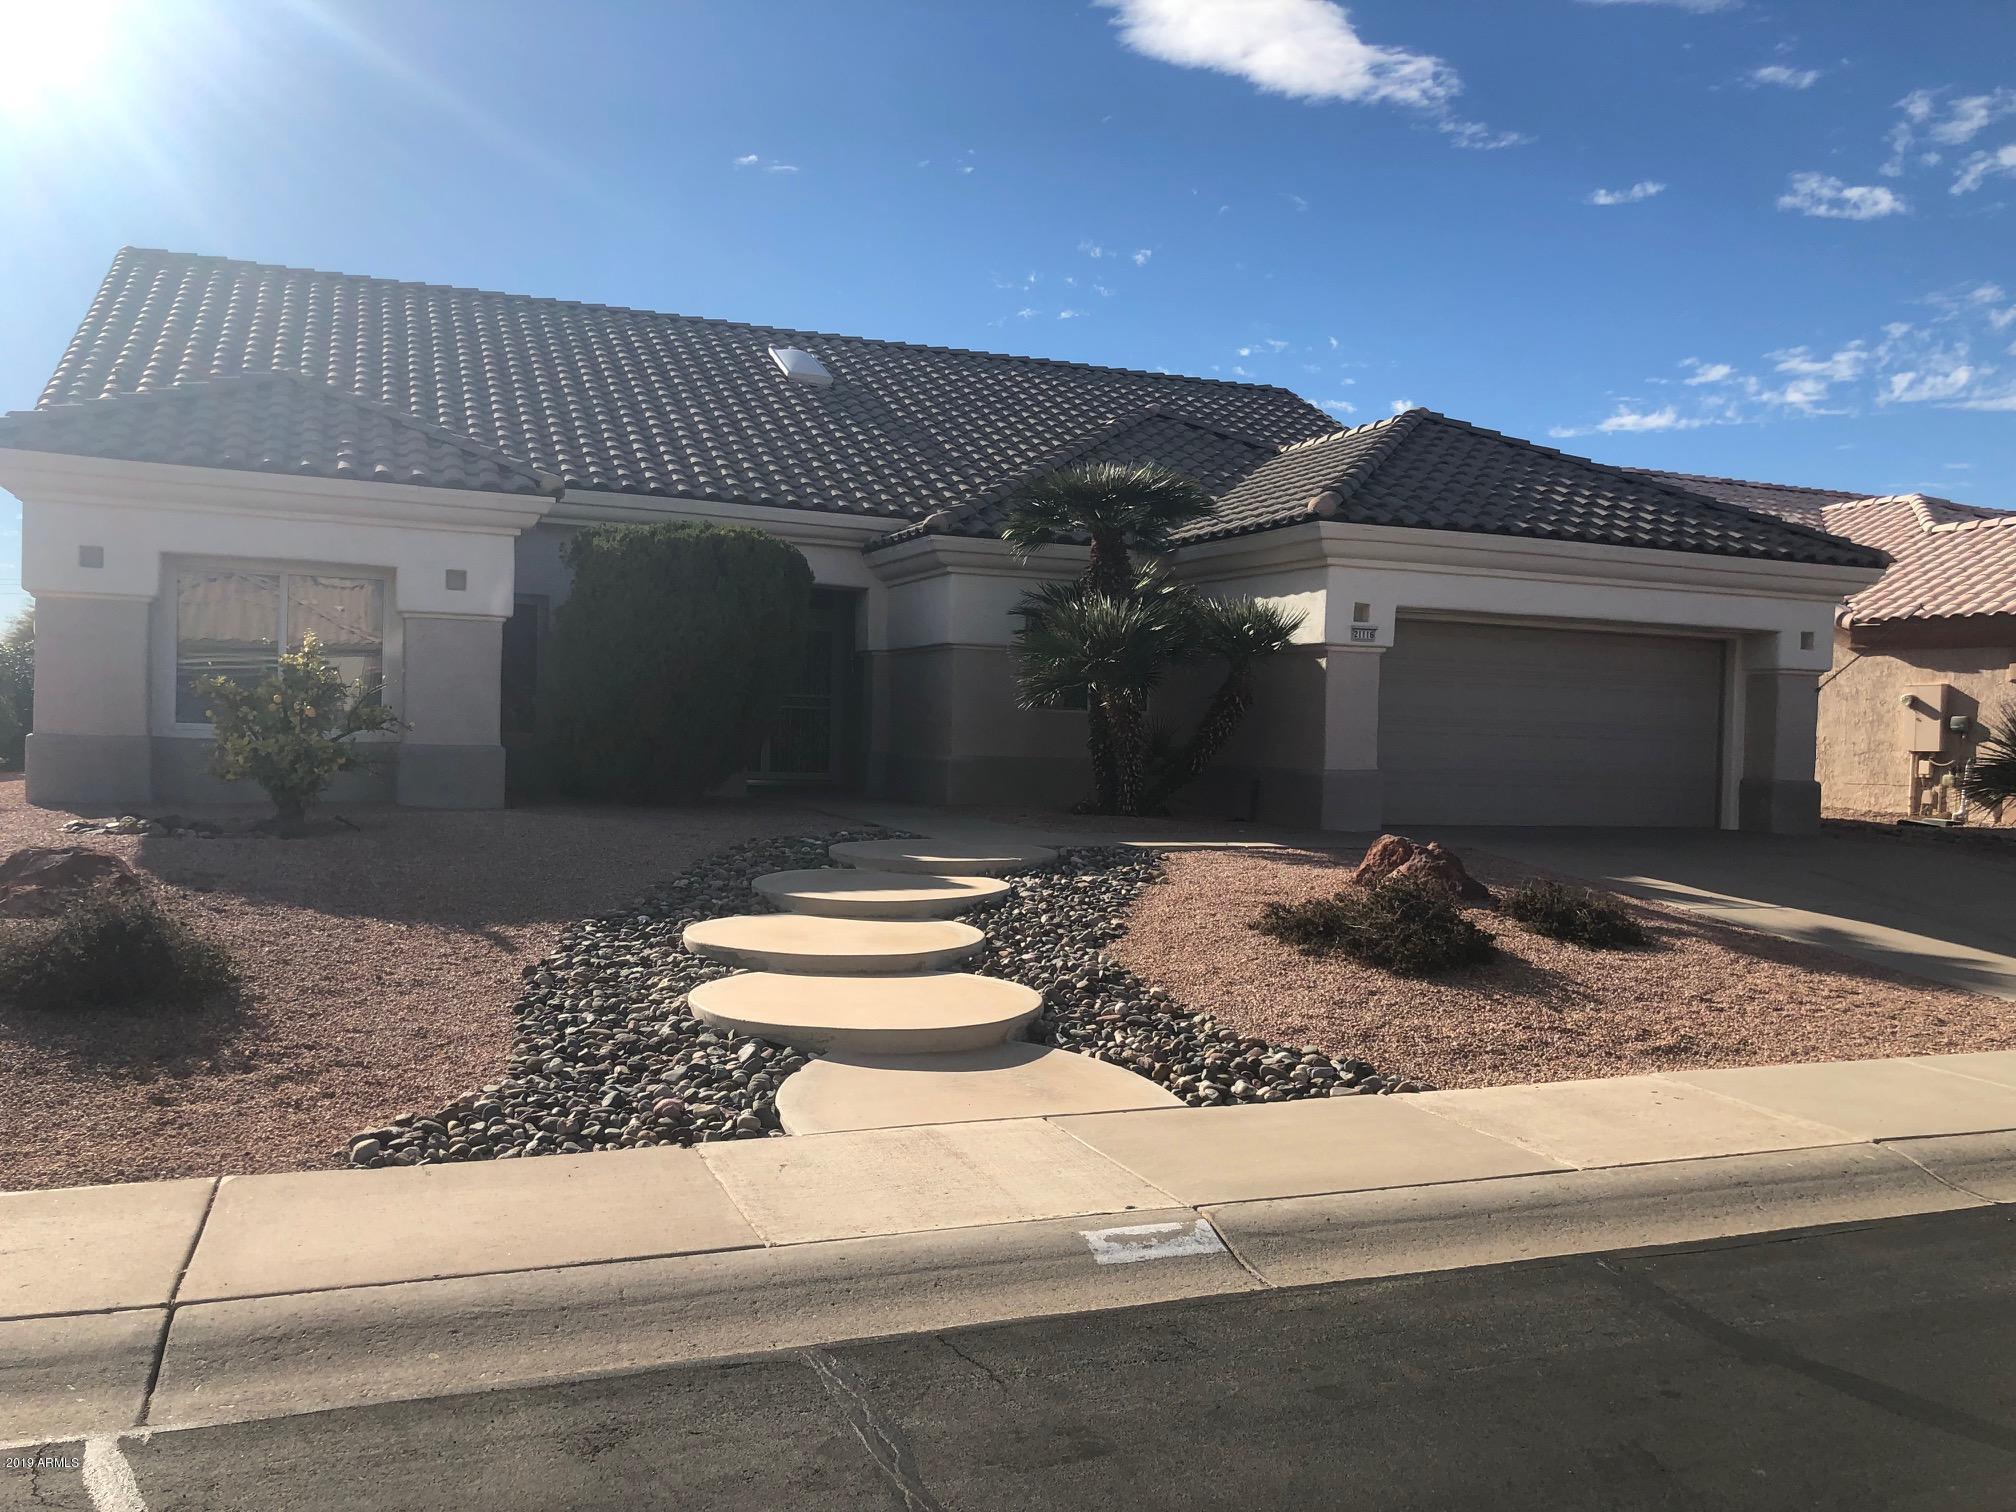 21116 N VERDE RIDGE Drive, Sun City West, AZ 85375, 3 Bedrooms Bedrooms, ,Residential Lease,For Rent,21116 N VERDE RIDGE Drive,5958079